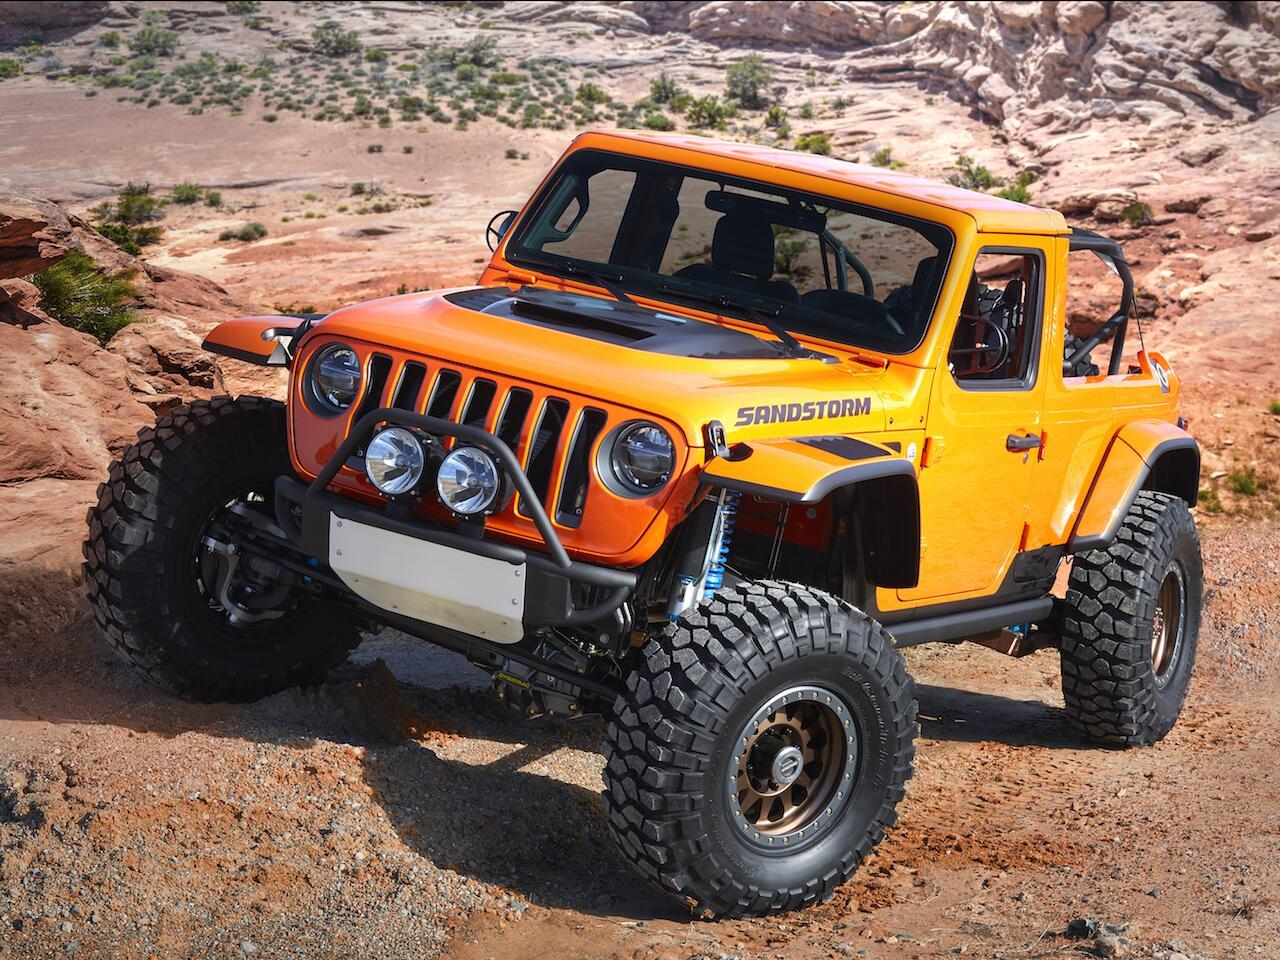 Bild zu Jeep Sandstorm Concept